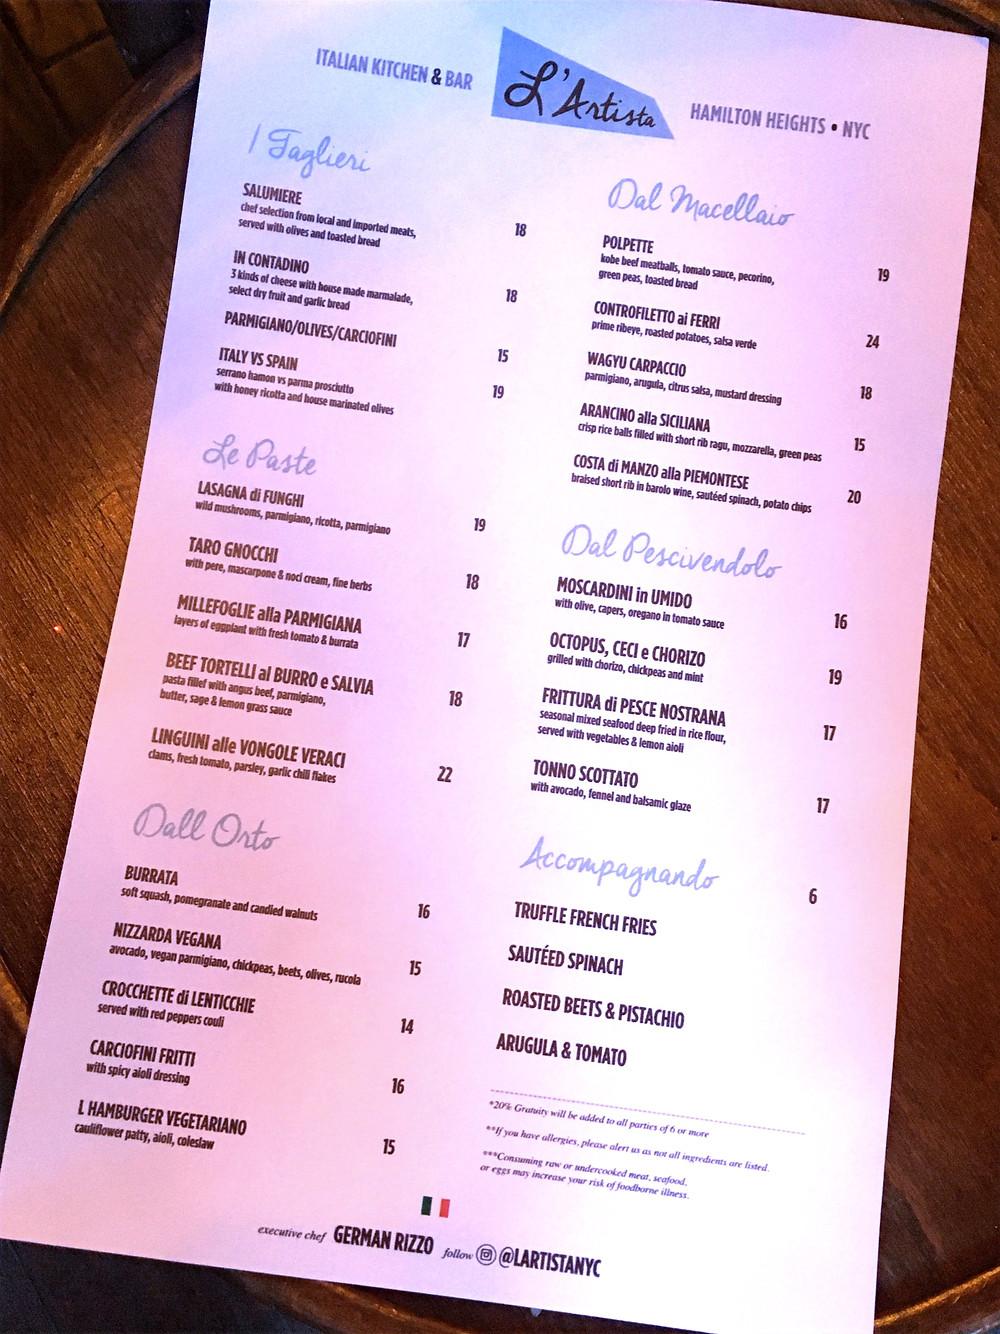 The Northern Italian menu at L'Artista in Hamilton Heights